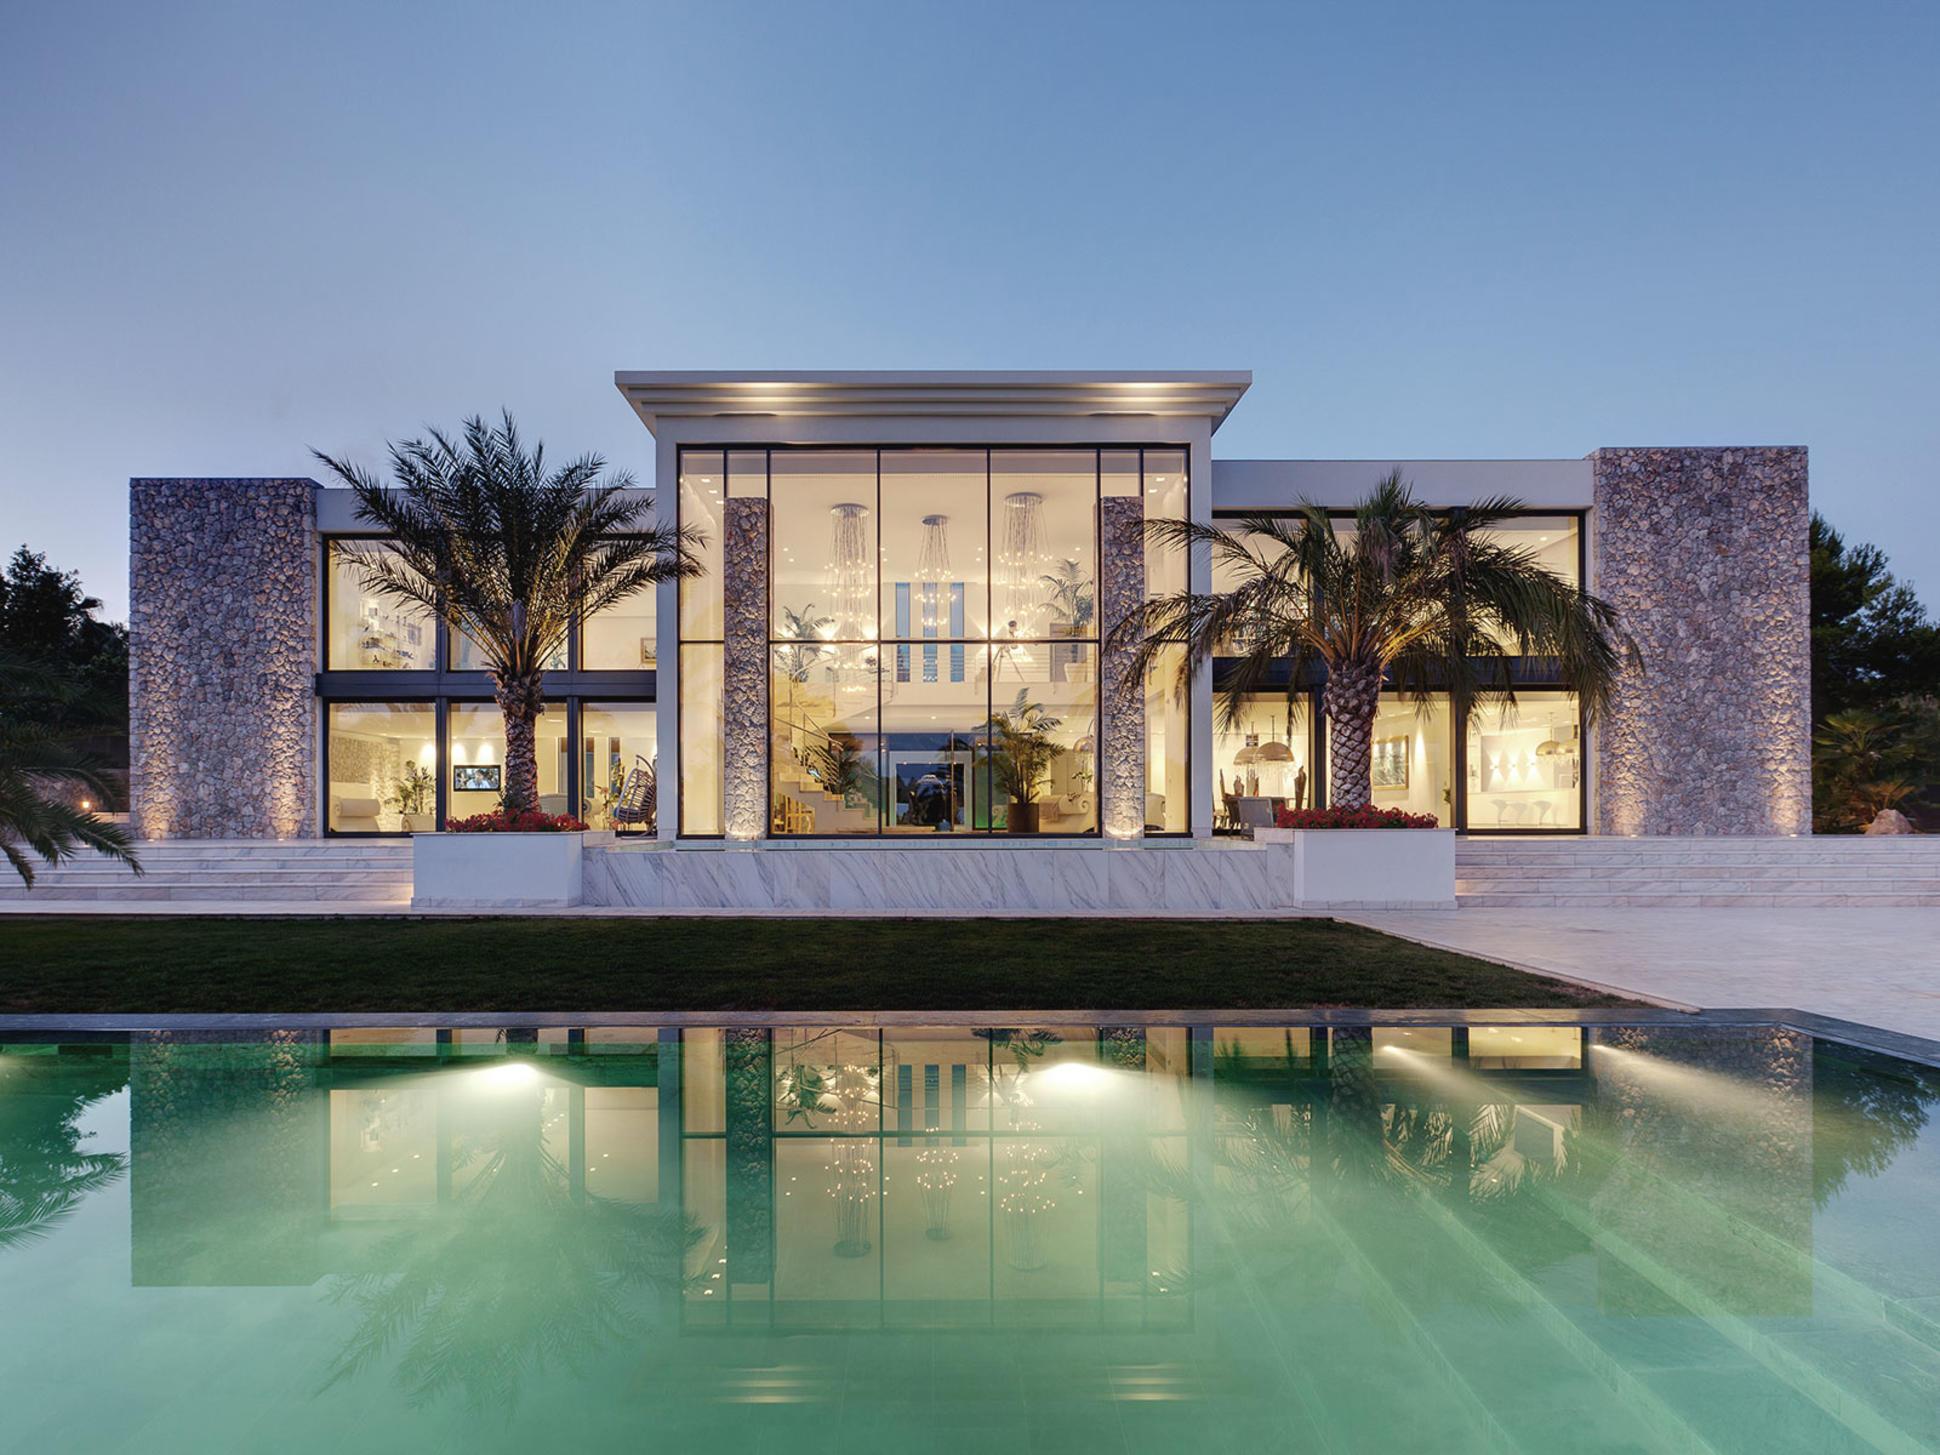 luxusimmobilie mit pool auf mallorca